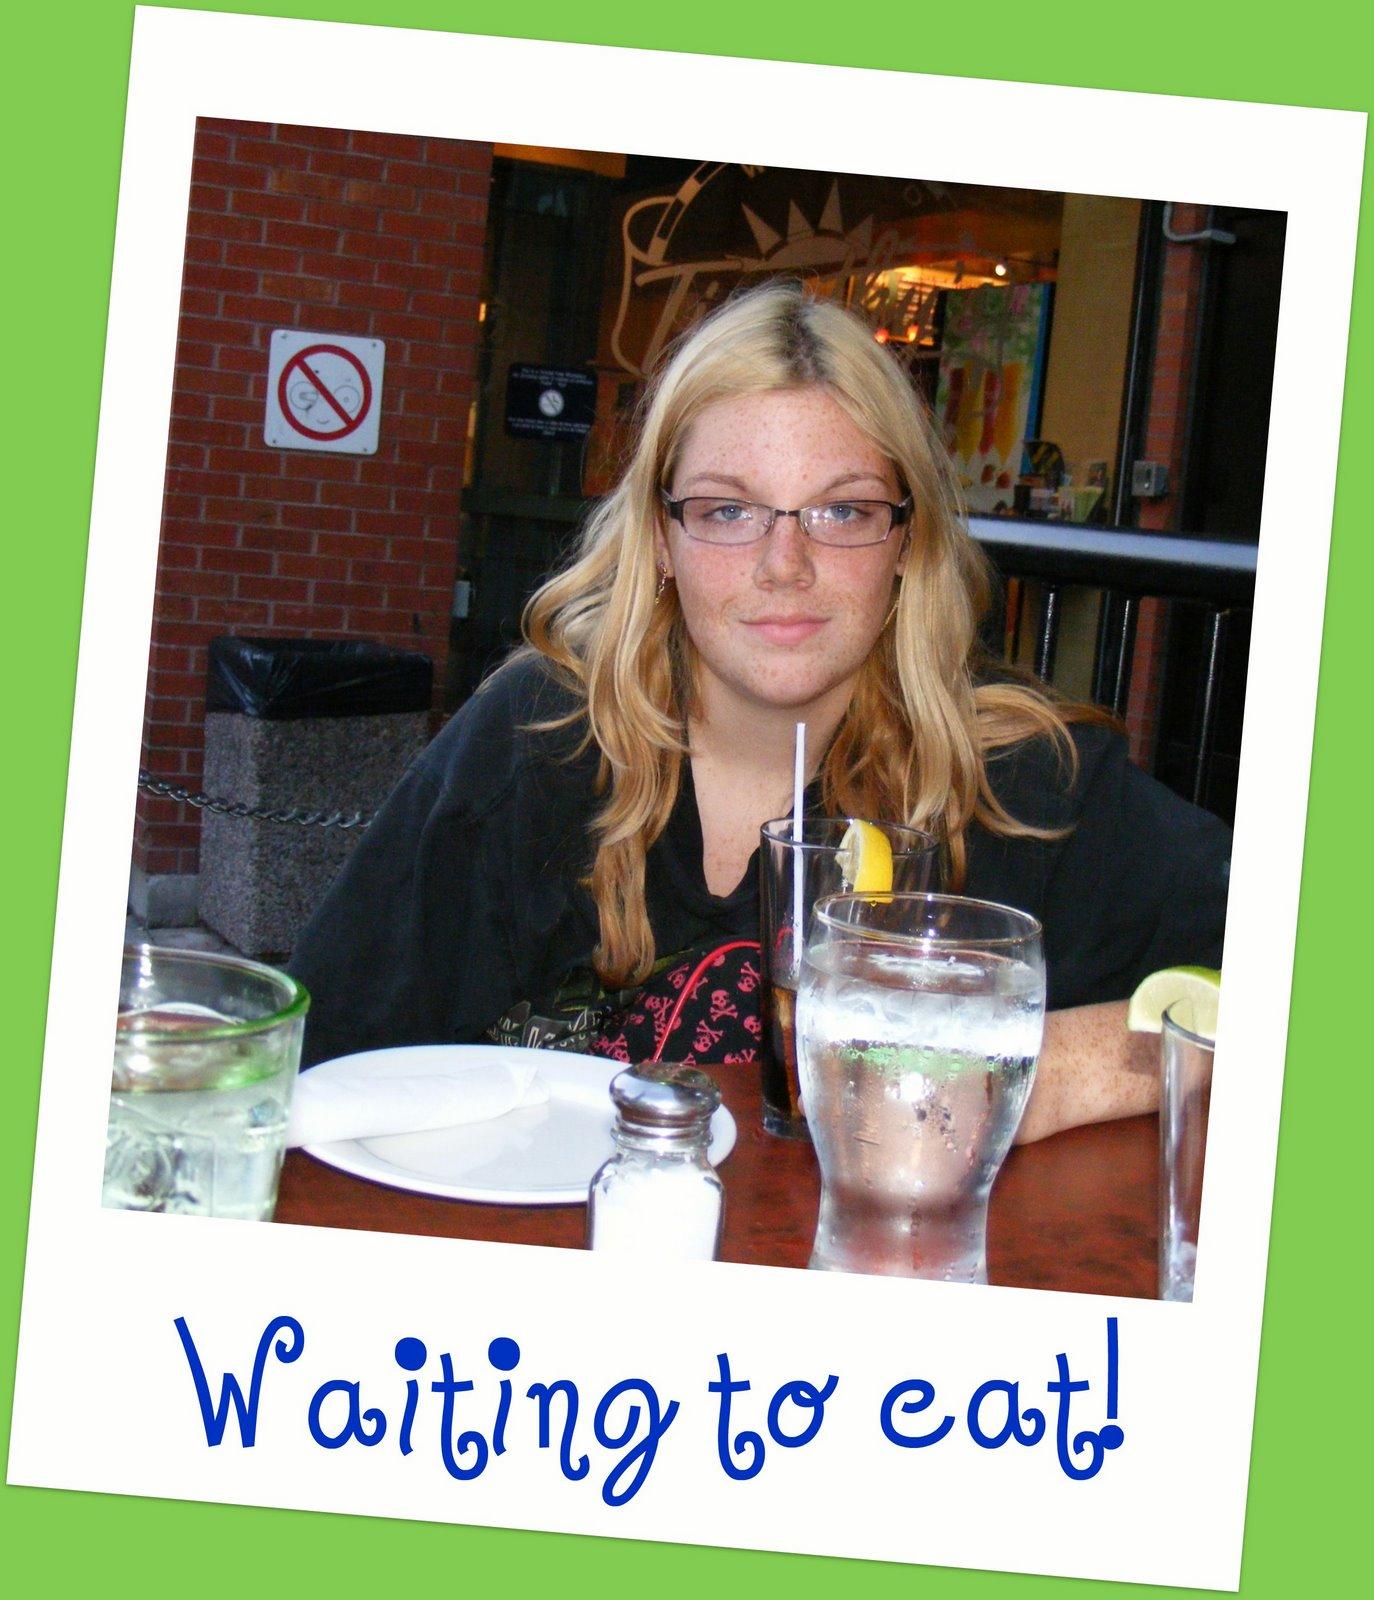 [Kristen+waits+to+eat.jpg]